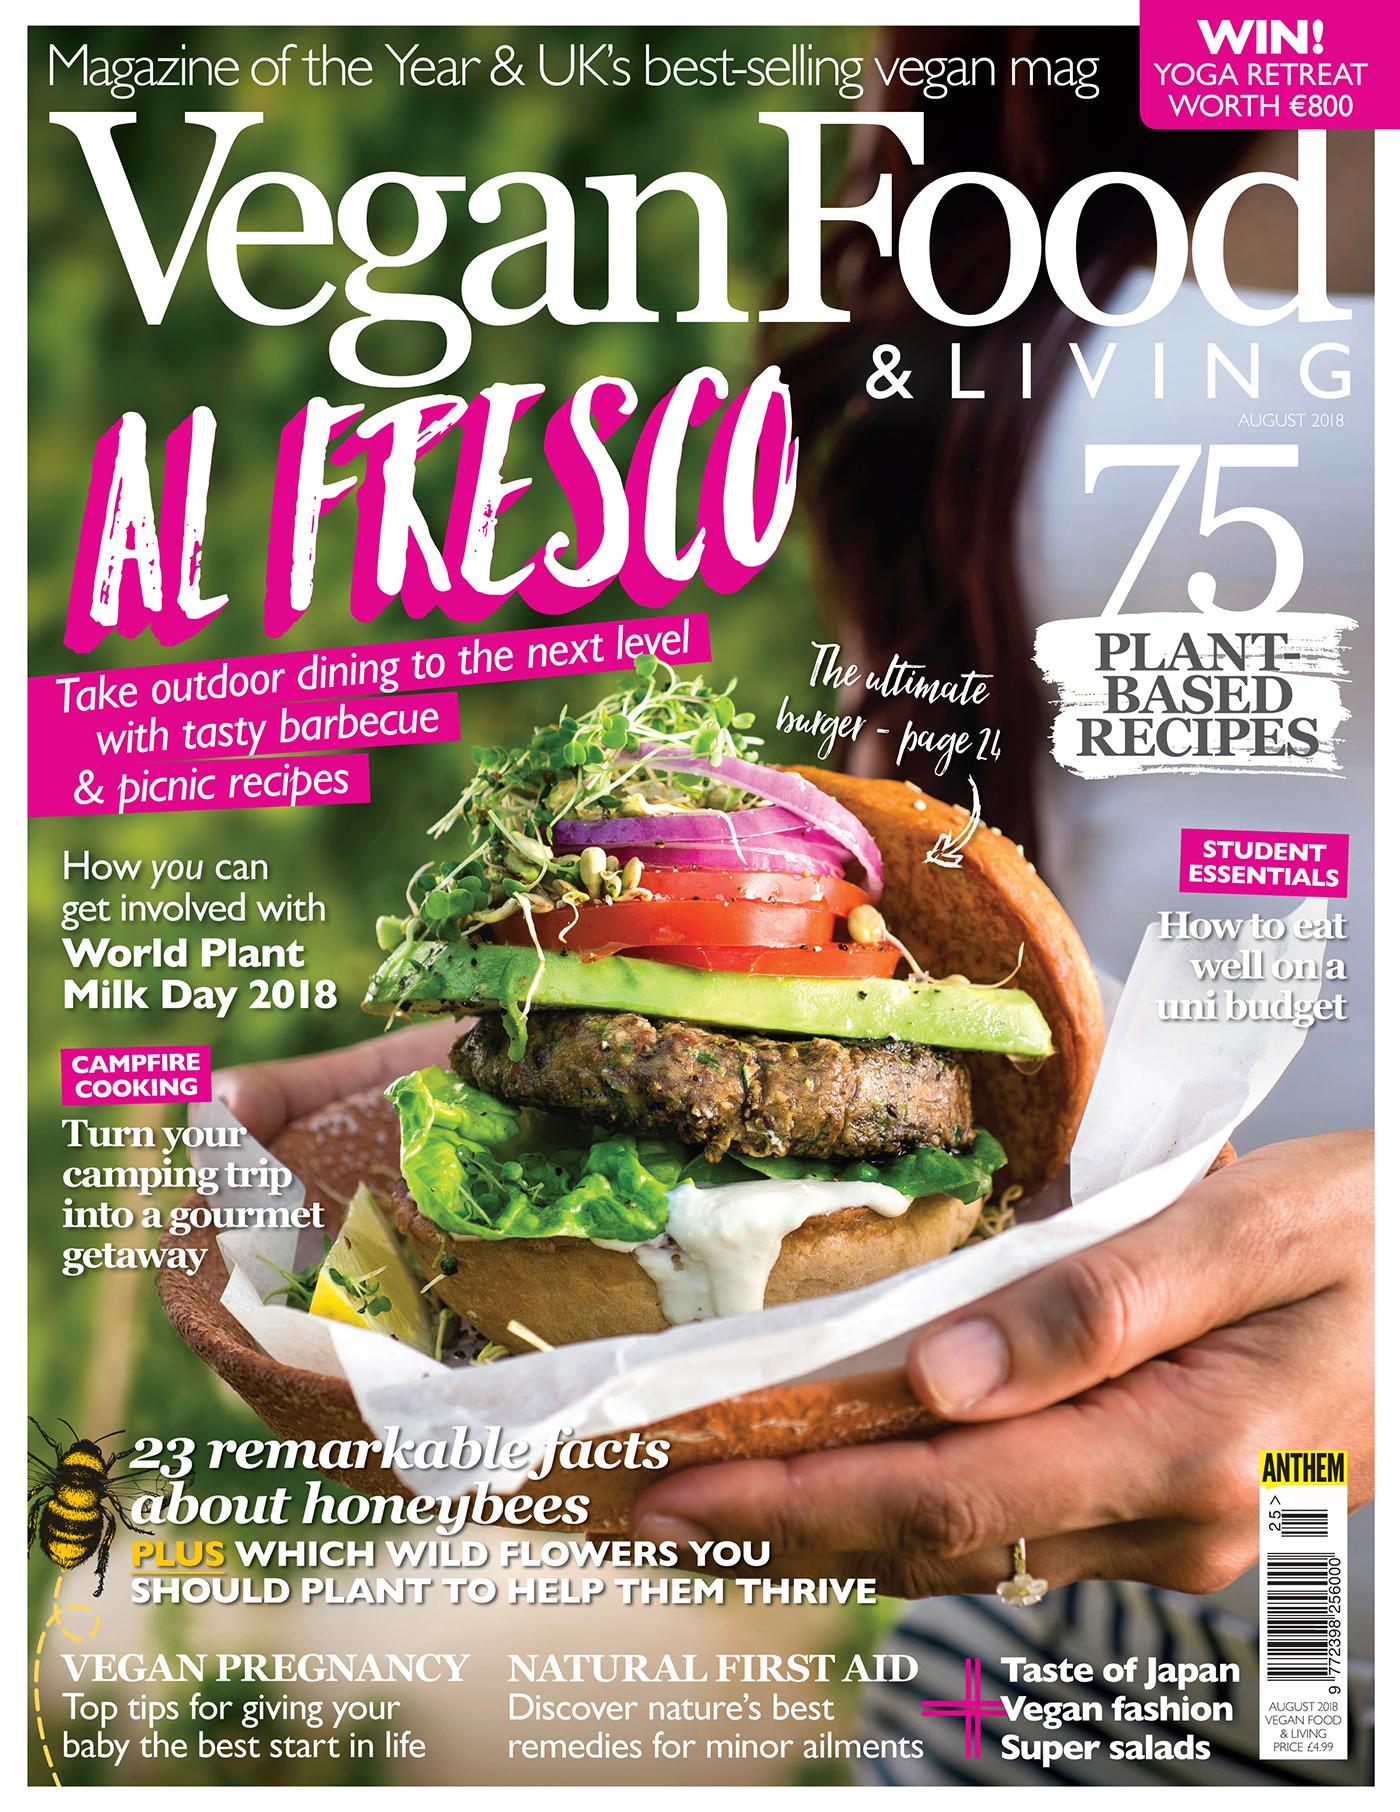 Vegan Food & Living August 2018